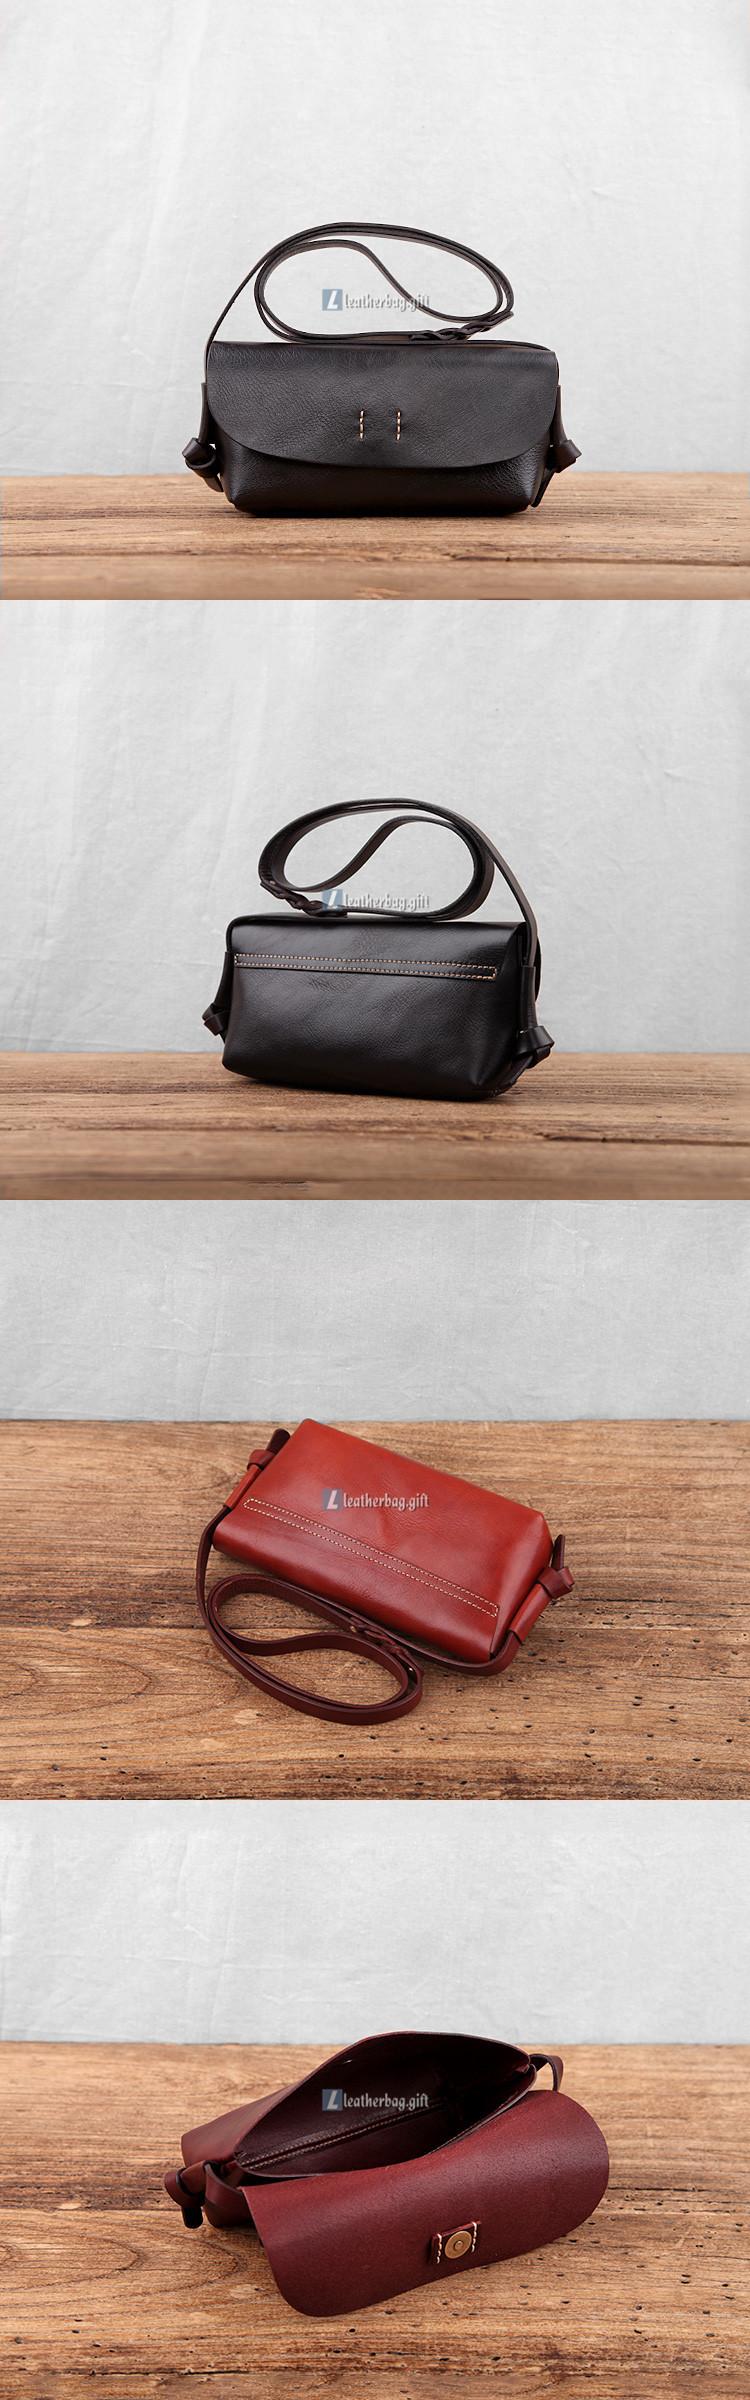 $152.50 Ladies Black Leather Shoulder Bags Cross Body Bag